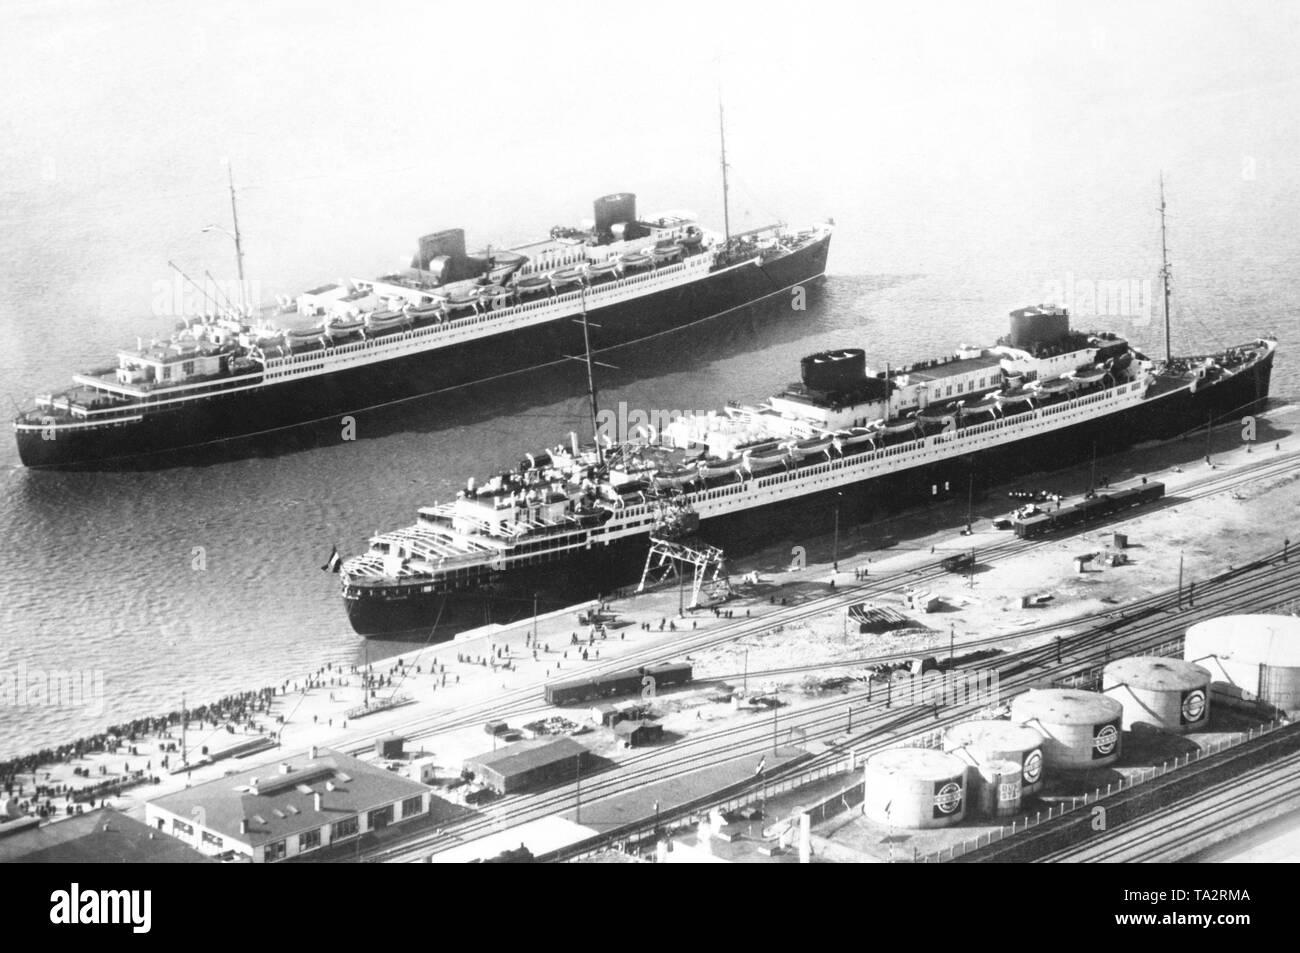 passenger ship vulcania 1930 - HD1300×953